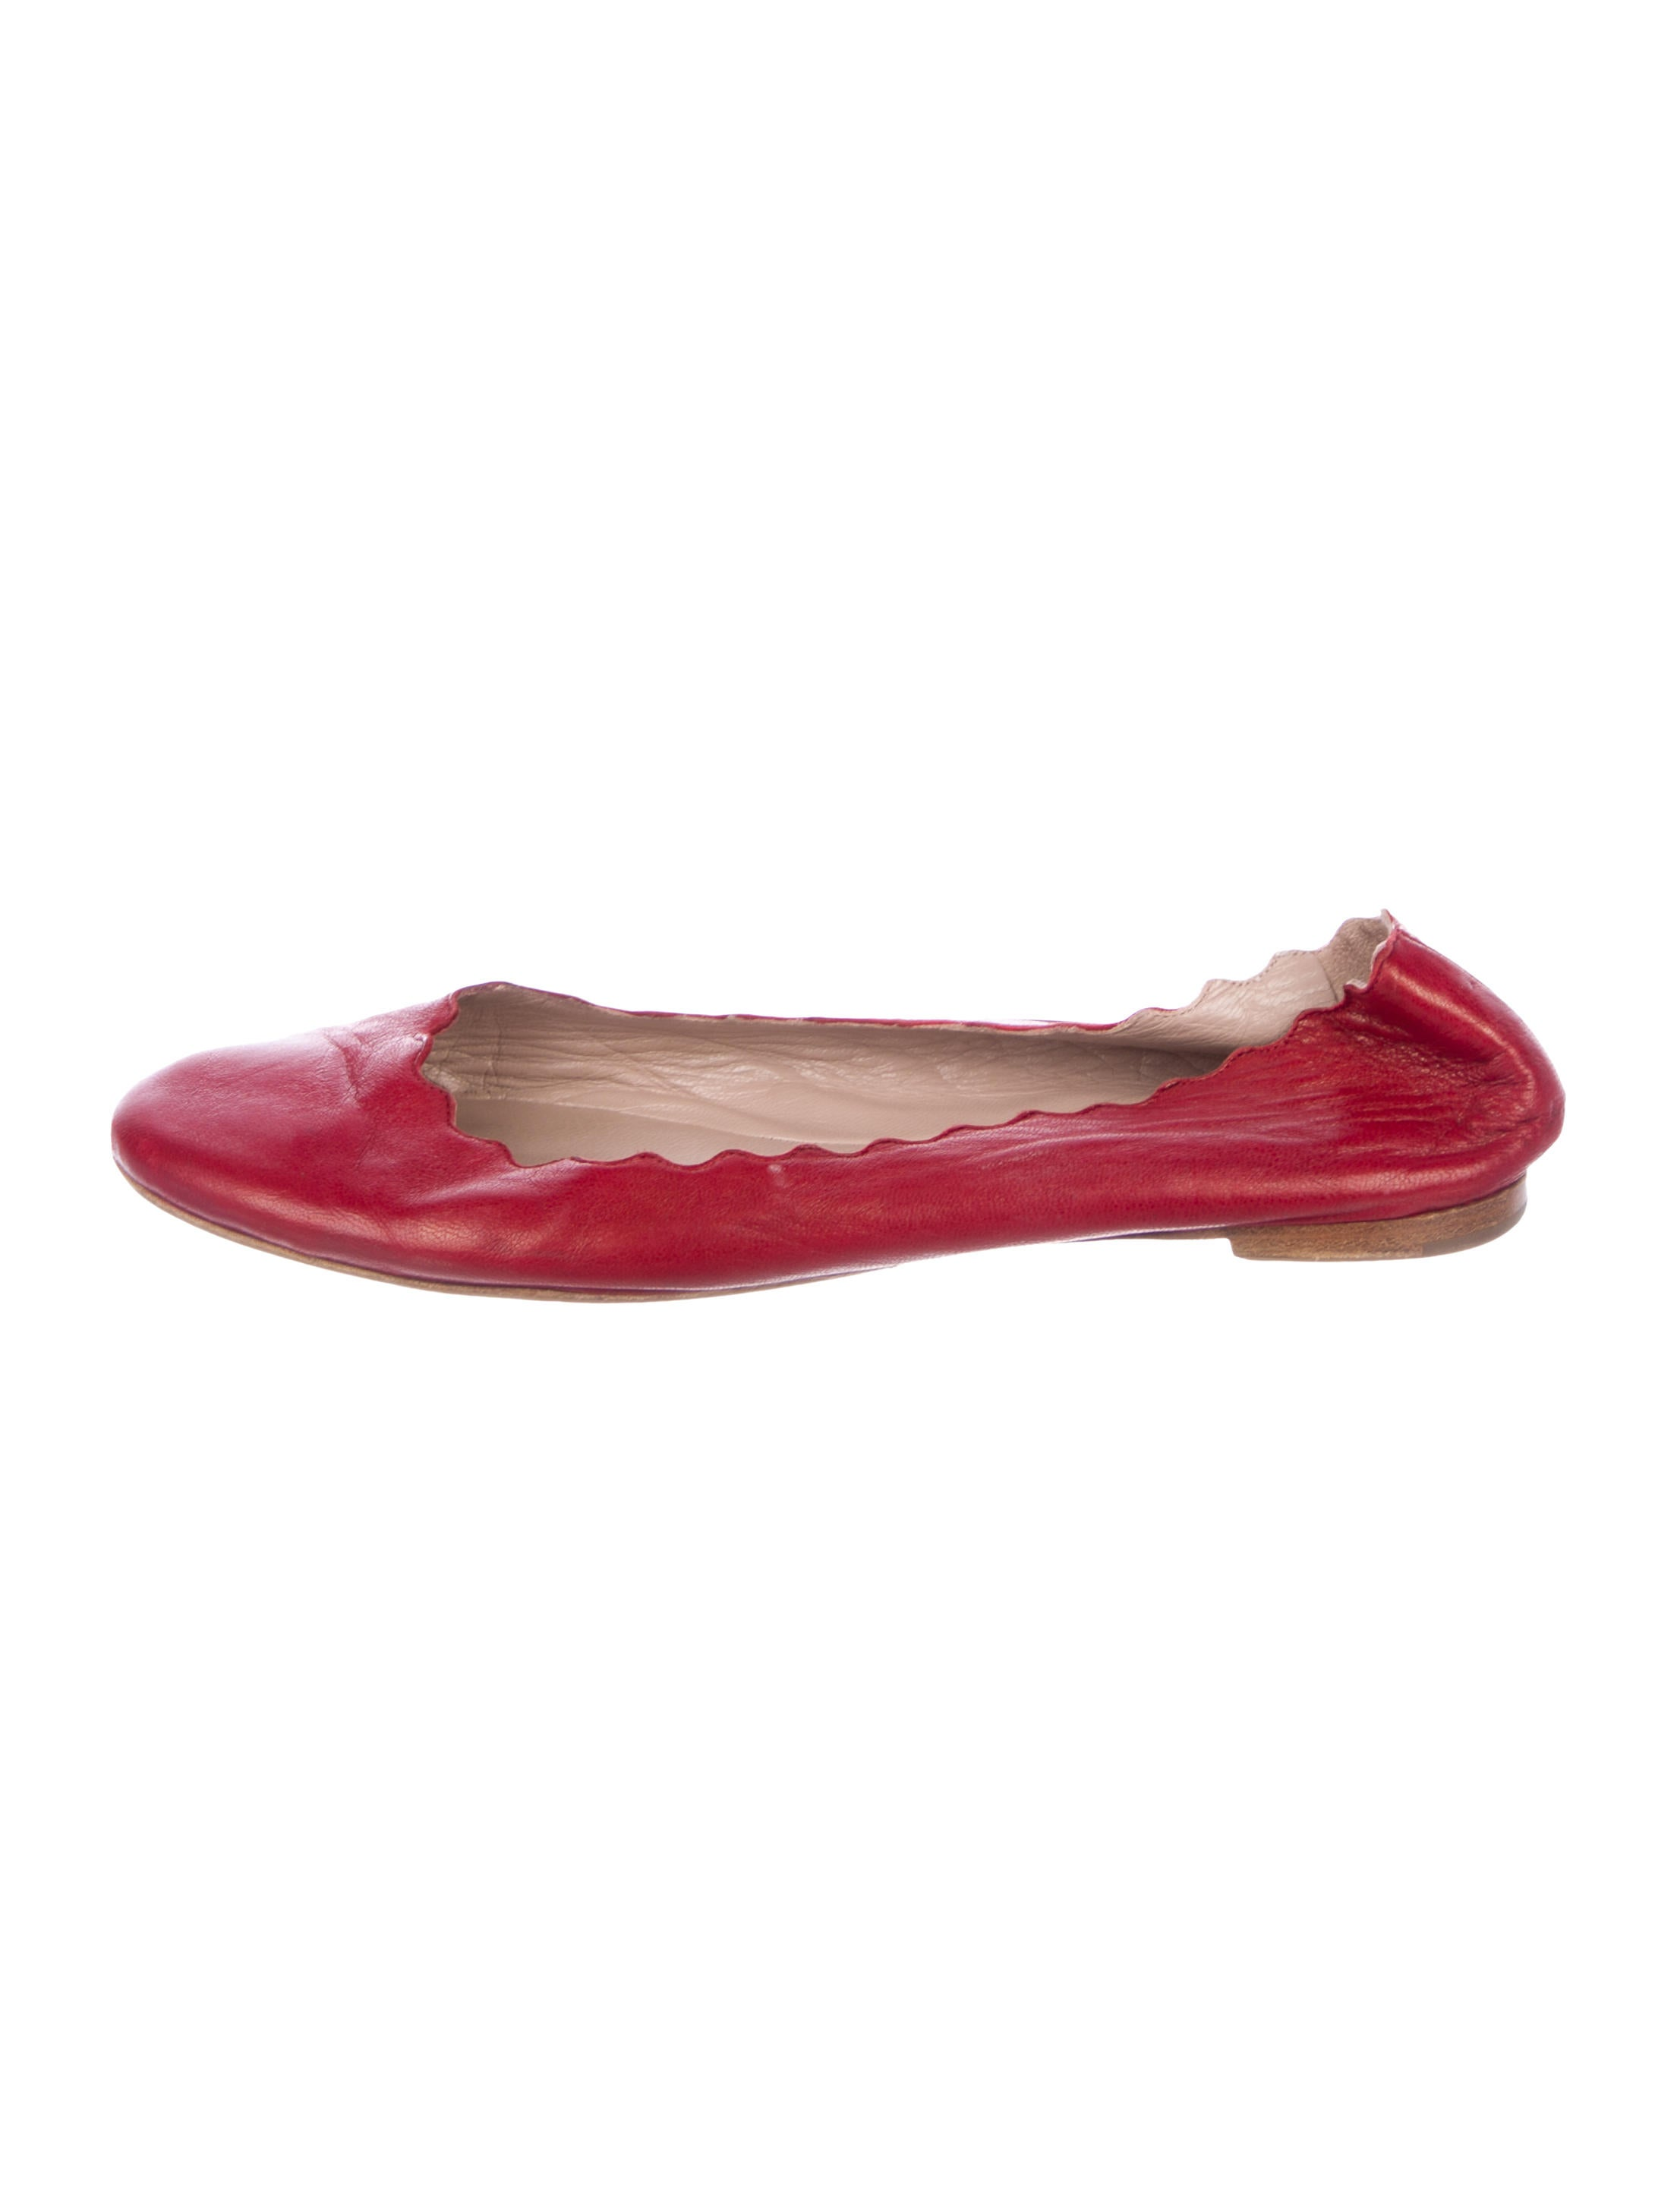 48342605857 Chloé Lauren Scalloped Flats - Shoes - CHL76304